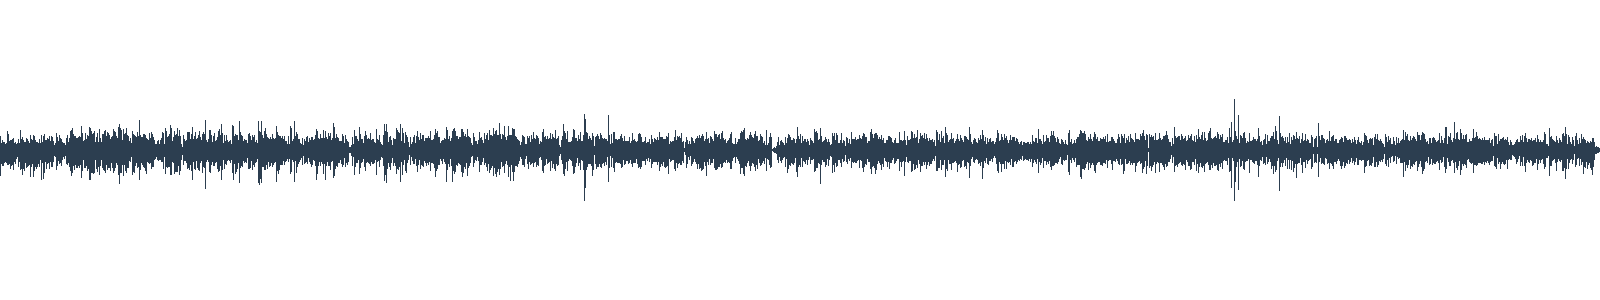 003. Mišo Stehlík 170 km beh okolo Mont Blancu waveform